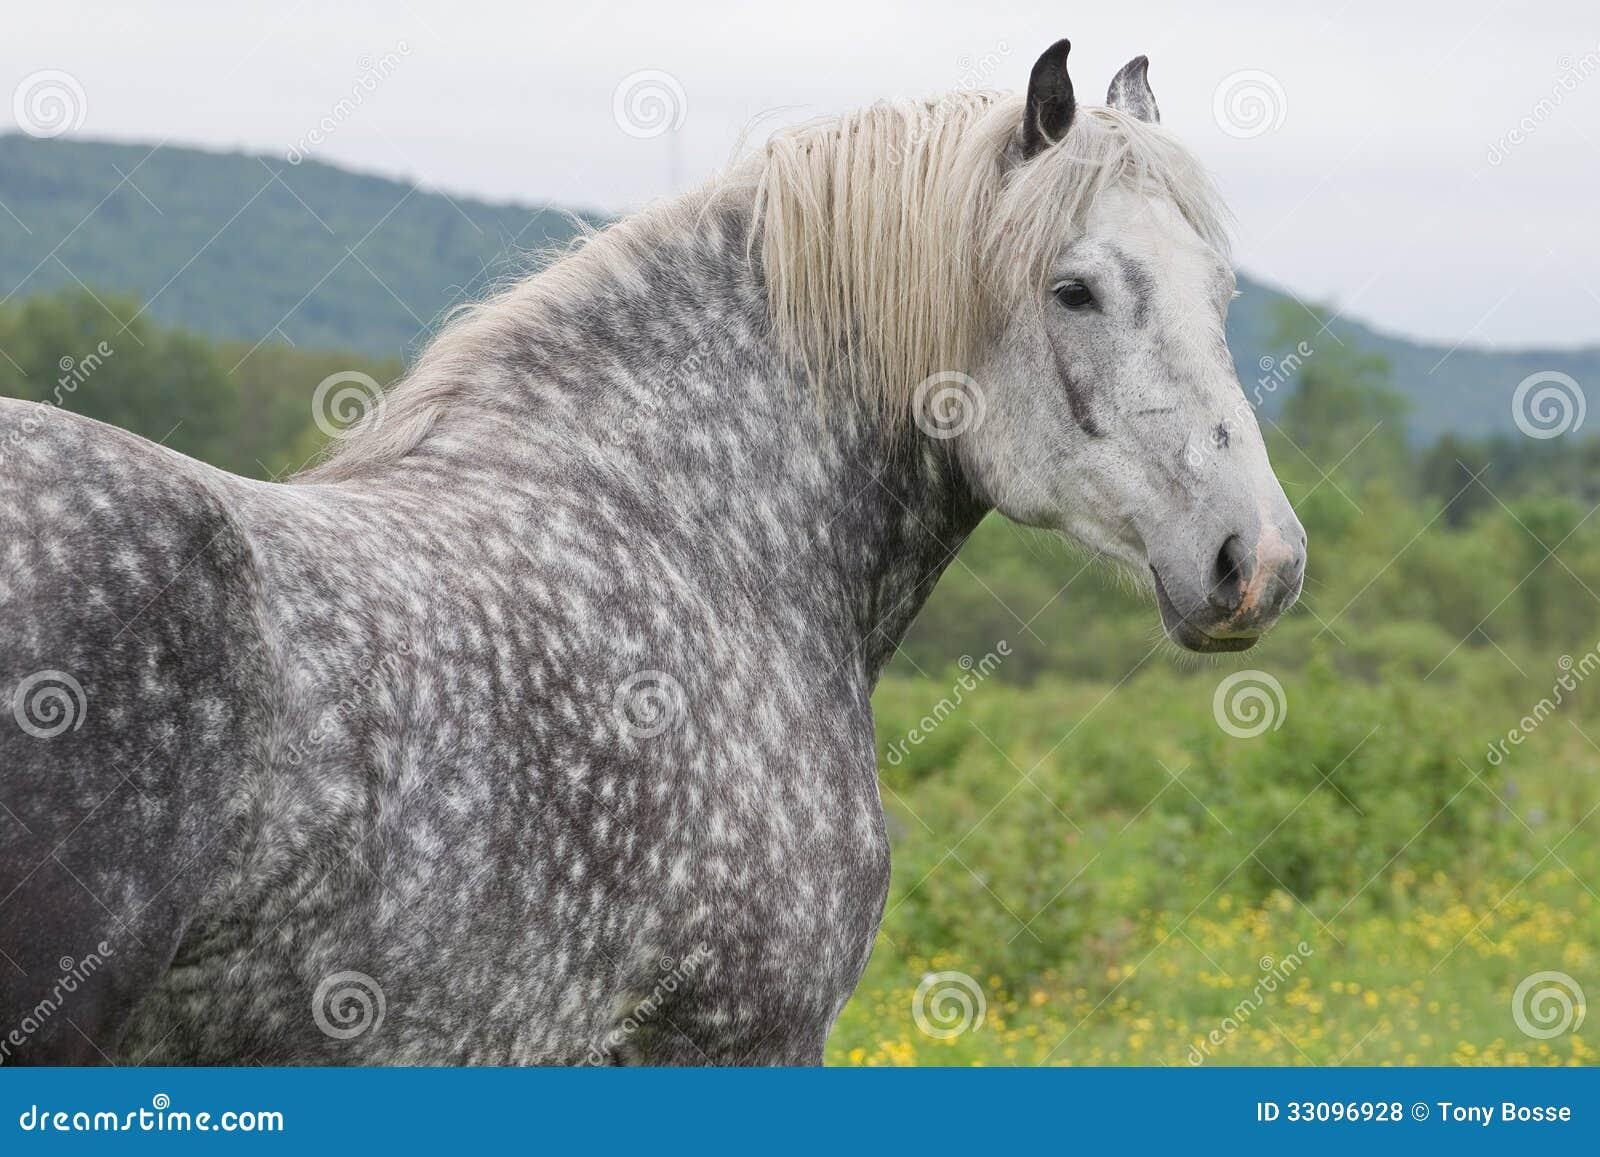 Young Percheron Draft Horse Stock Photo Image Of Mare Purebred 33096928